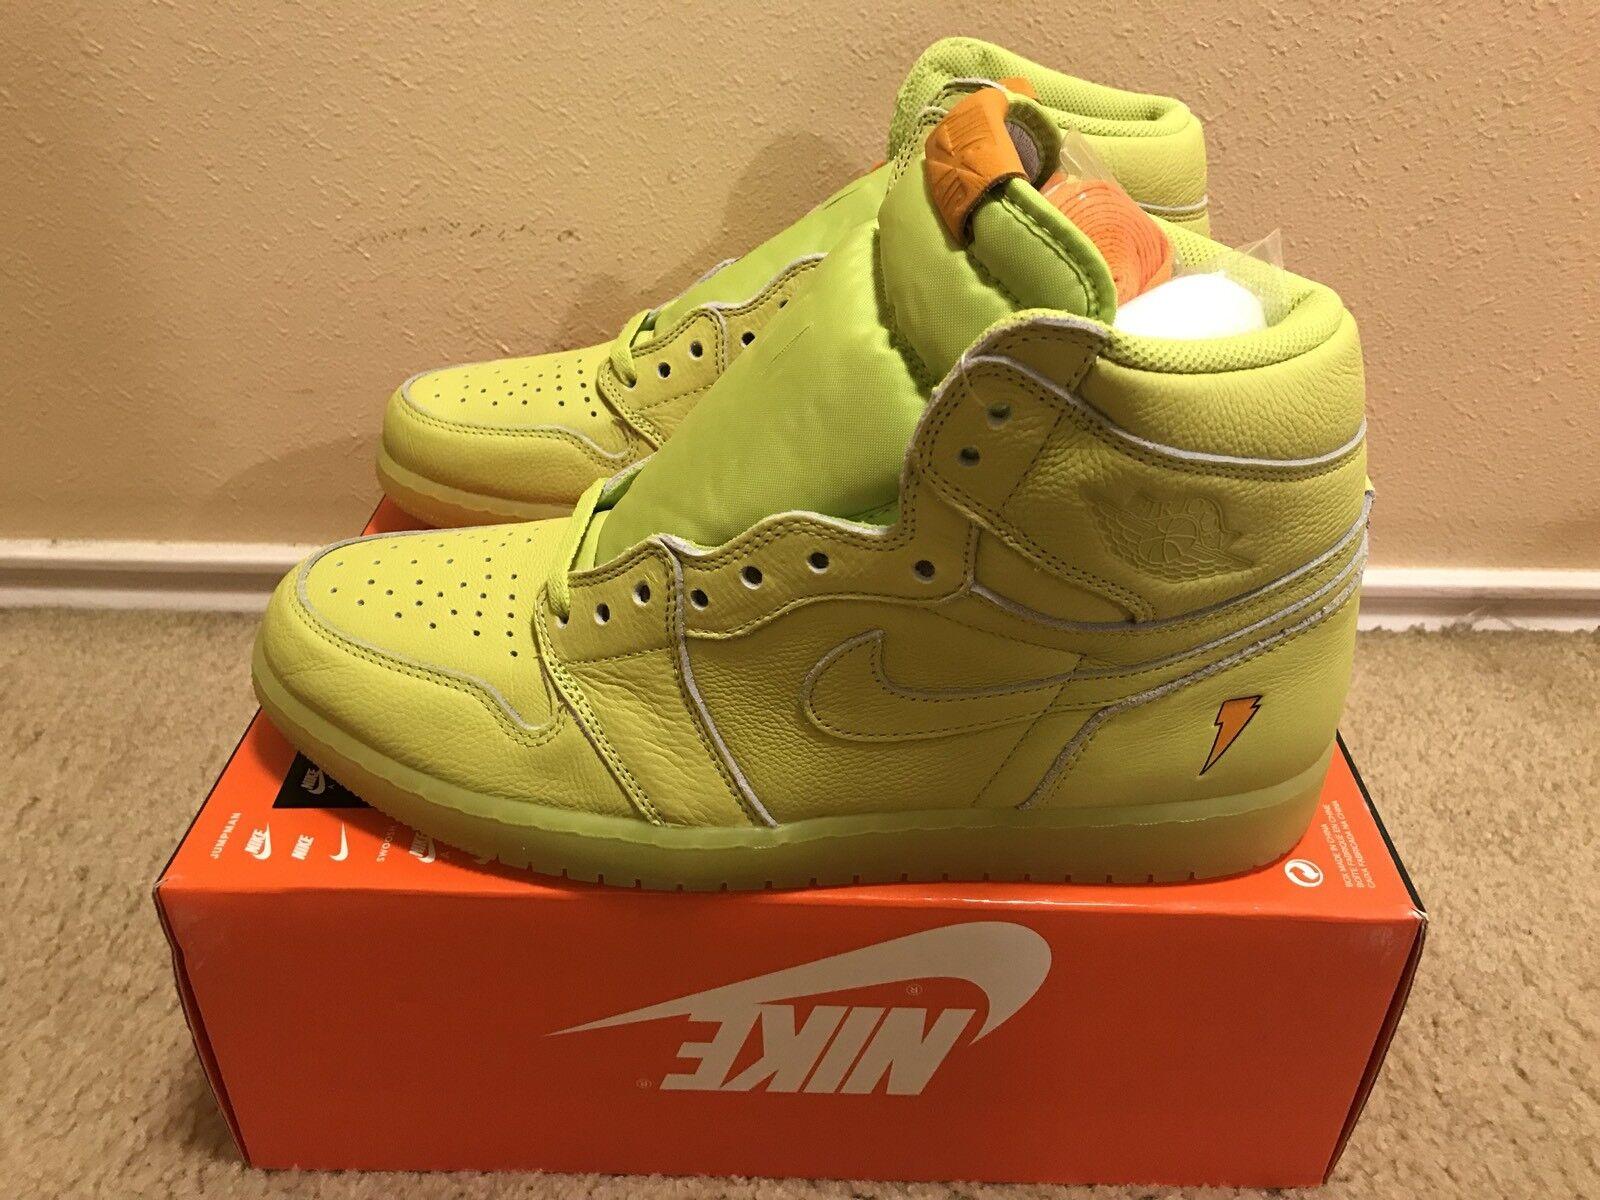 Nike Air Jordan 1 Retro HI OG G8RD Gatorade Homme sz 13 Cyber Lime AJ5997 345